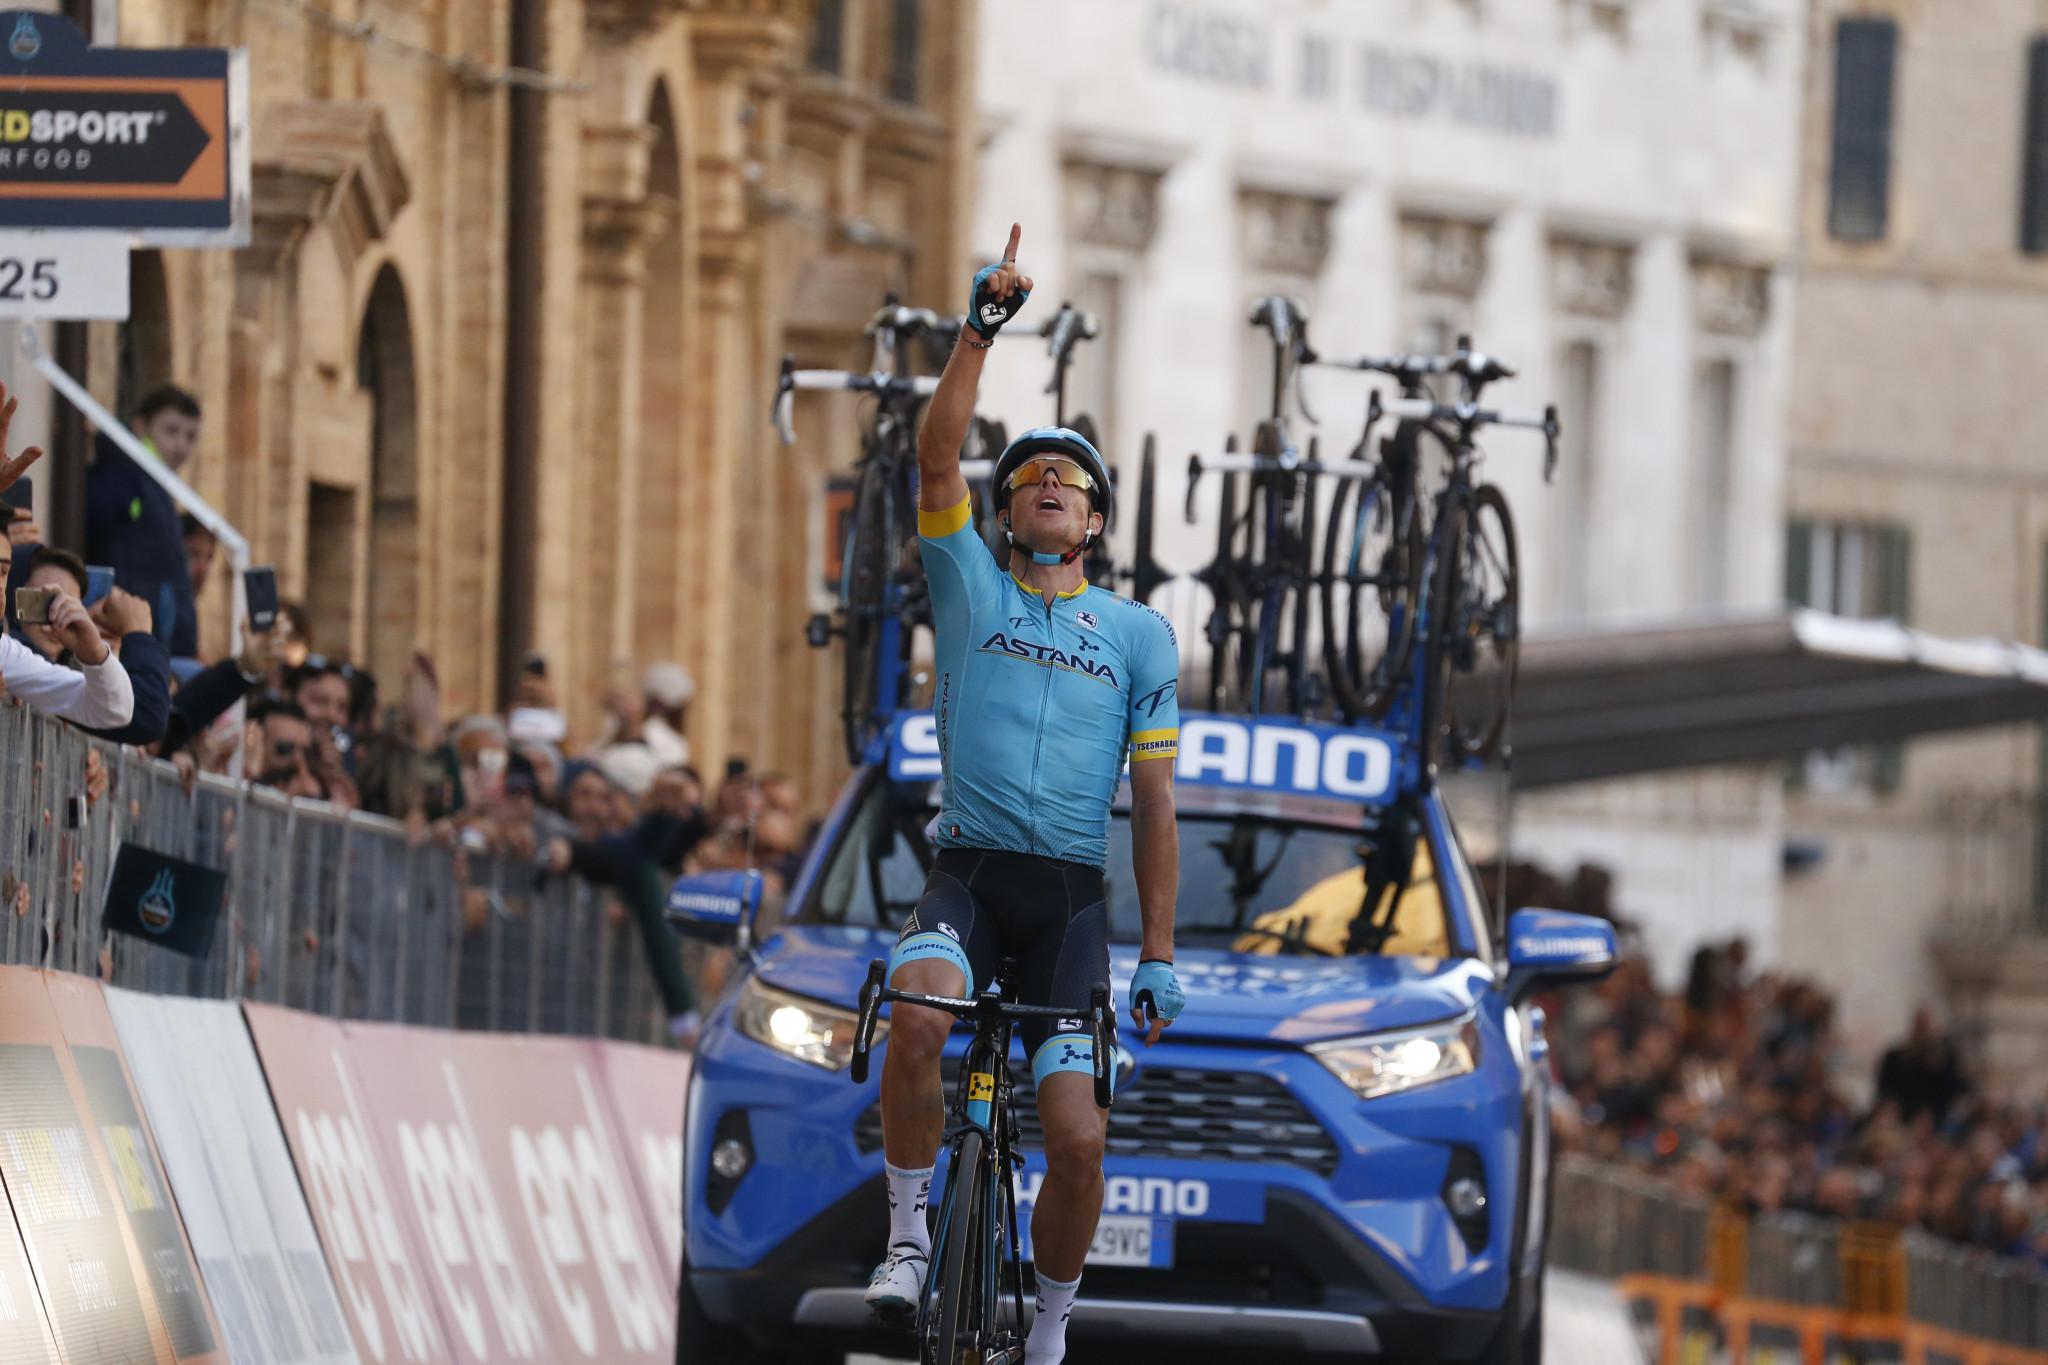 Jakob Fuglsang won today's Liège-Bastogne-Liège classic race ©Getty Images